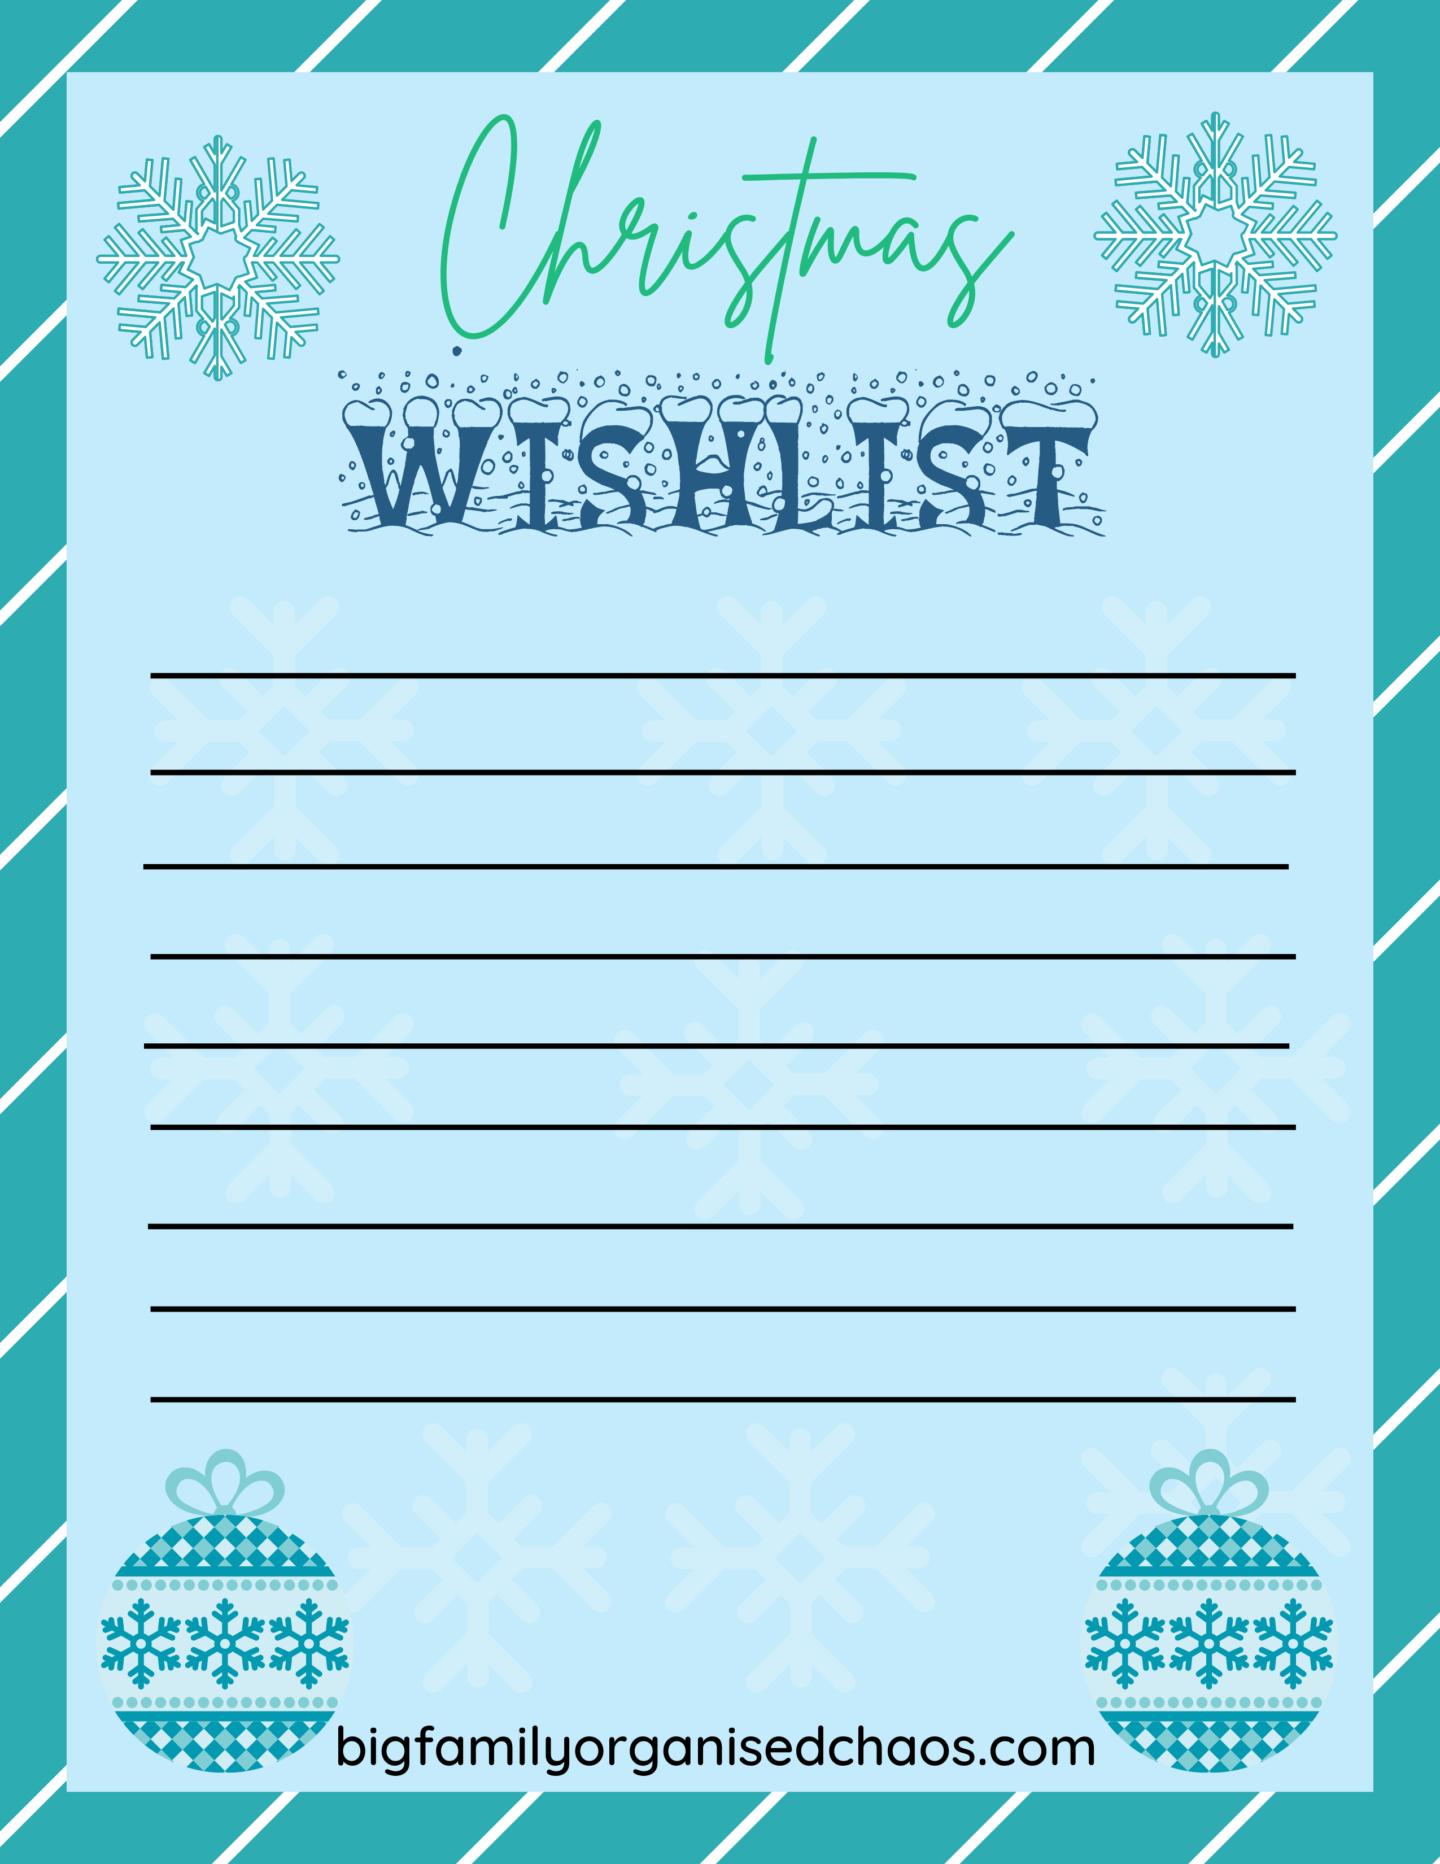 letters to Santa christmas wish list